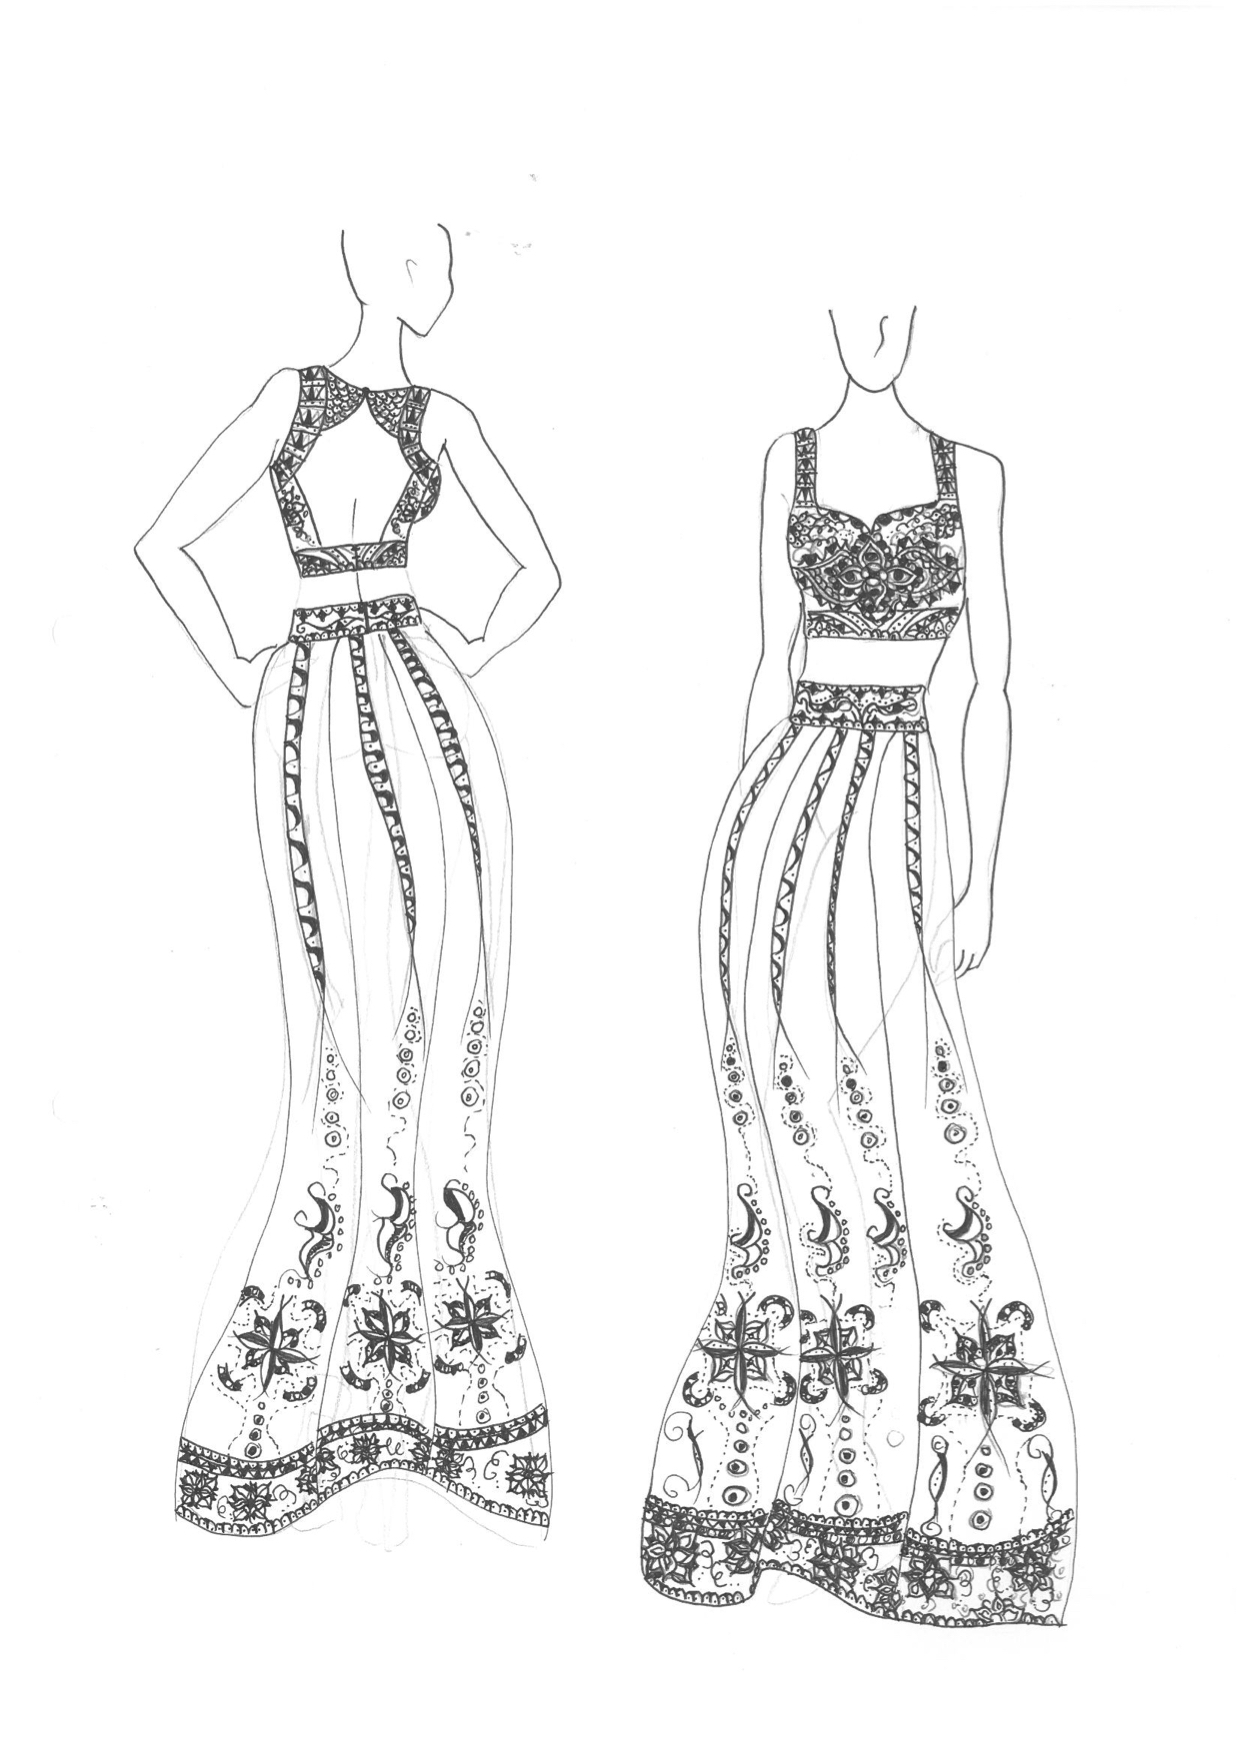 Singapore Based Fashion Start Up Liiloodesigns